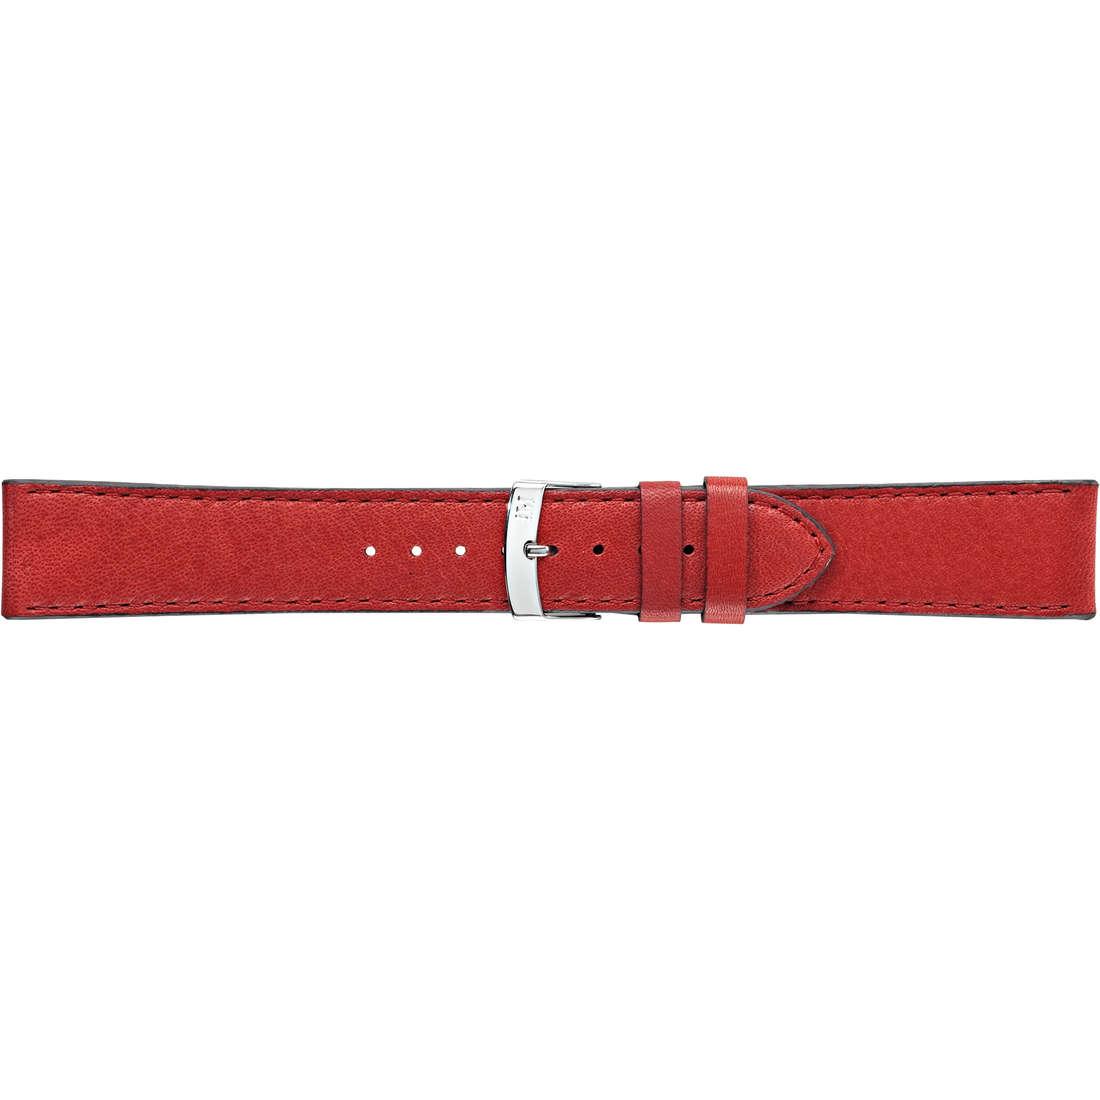 watch watch bands watch straps man Morellato Performance A01X3688A37082CR20